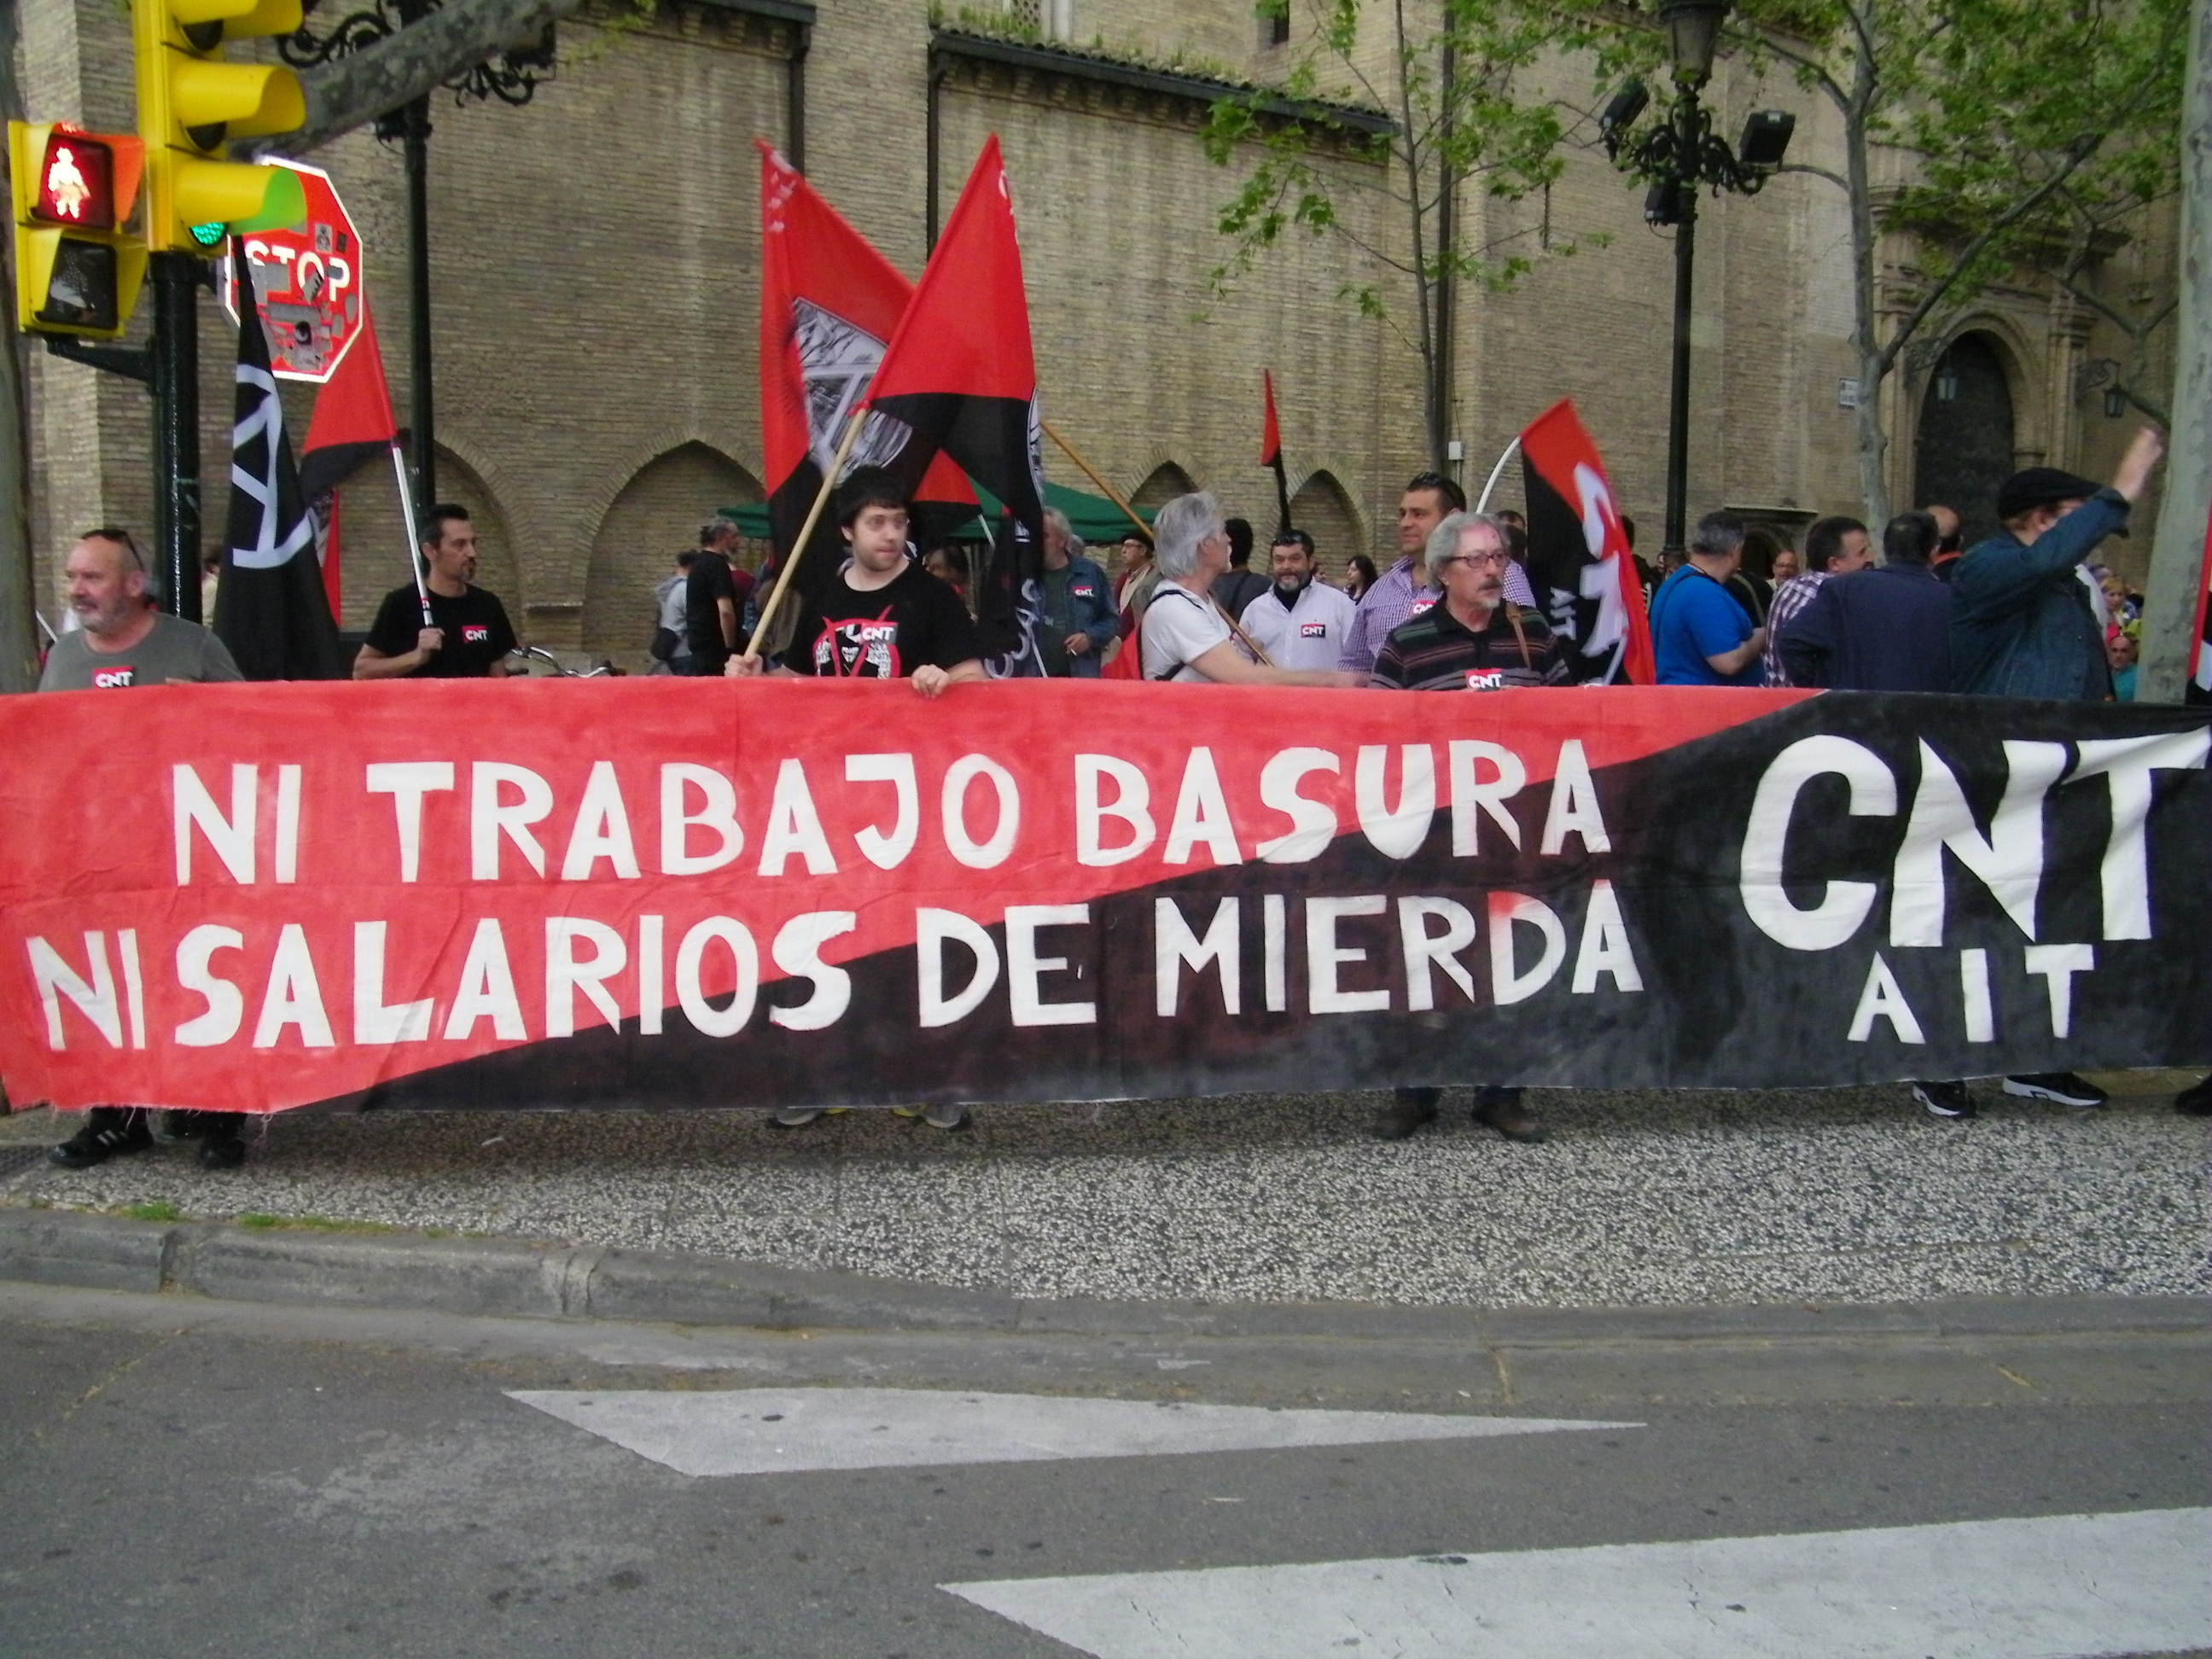 CNT-Zaragoza-en-la-manifestacion-FCC-parques-jardines-10-abril-comienzo